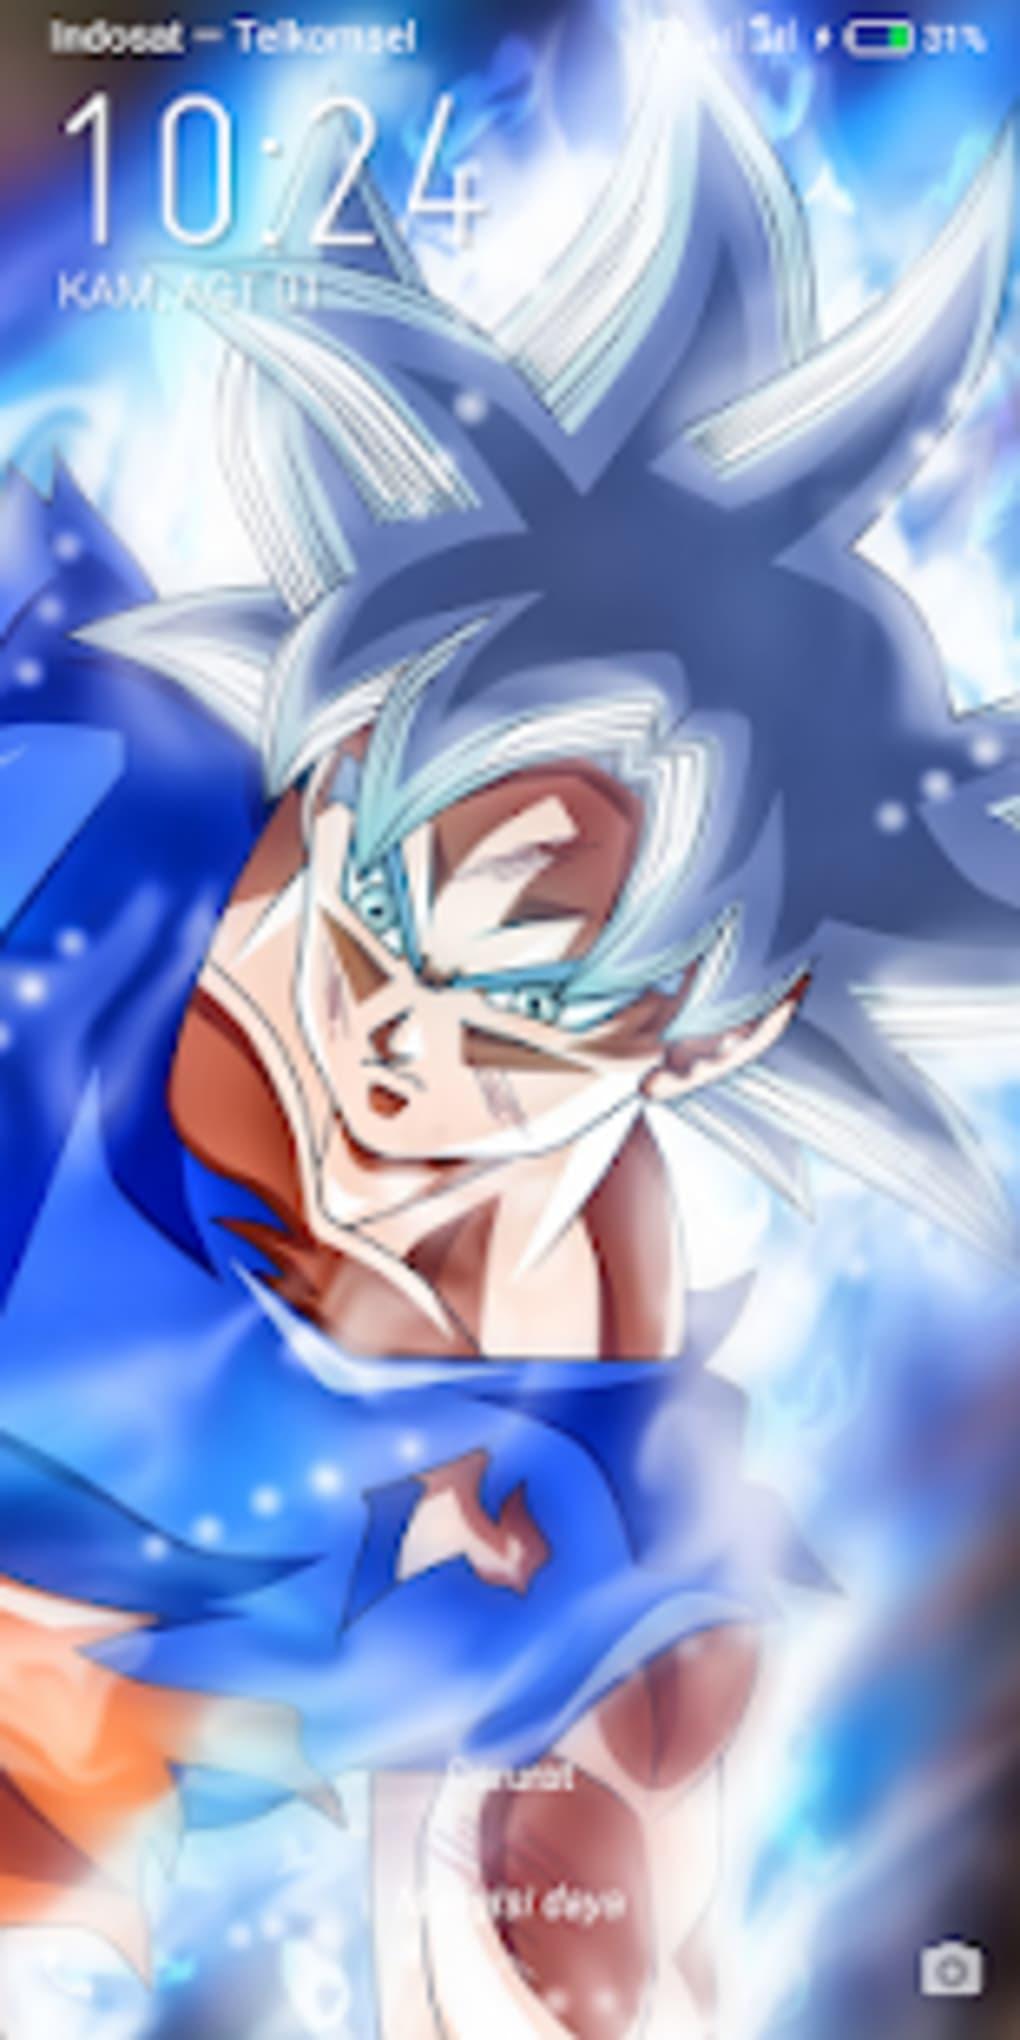 Dragon Ball Super Wallpapers Goku Ultra Instinct Master Wallpaper Hd 1020x2040 Wallpaper Teahub Io